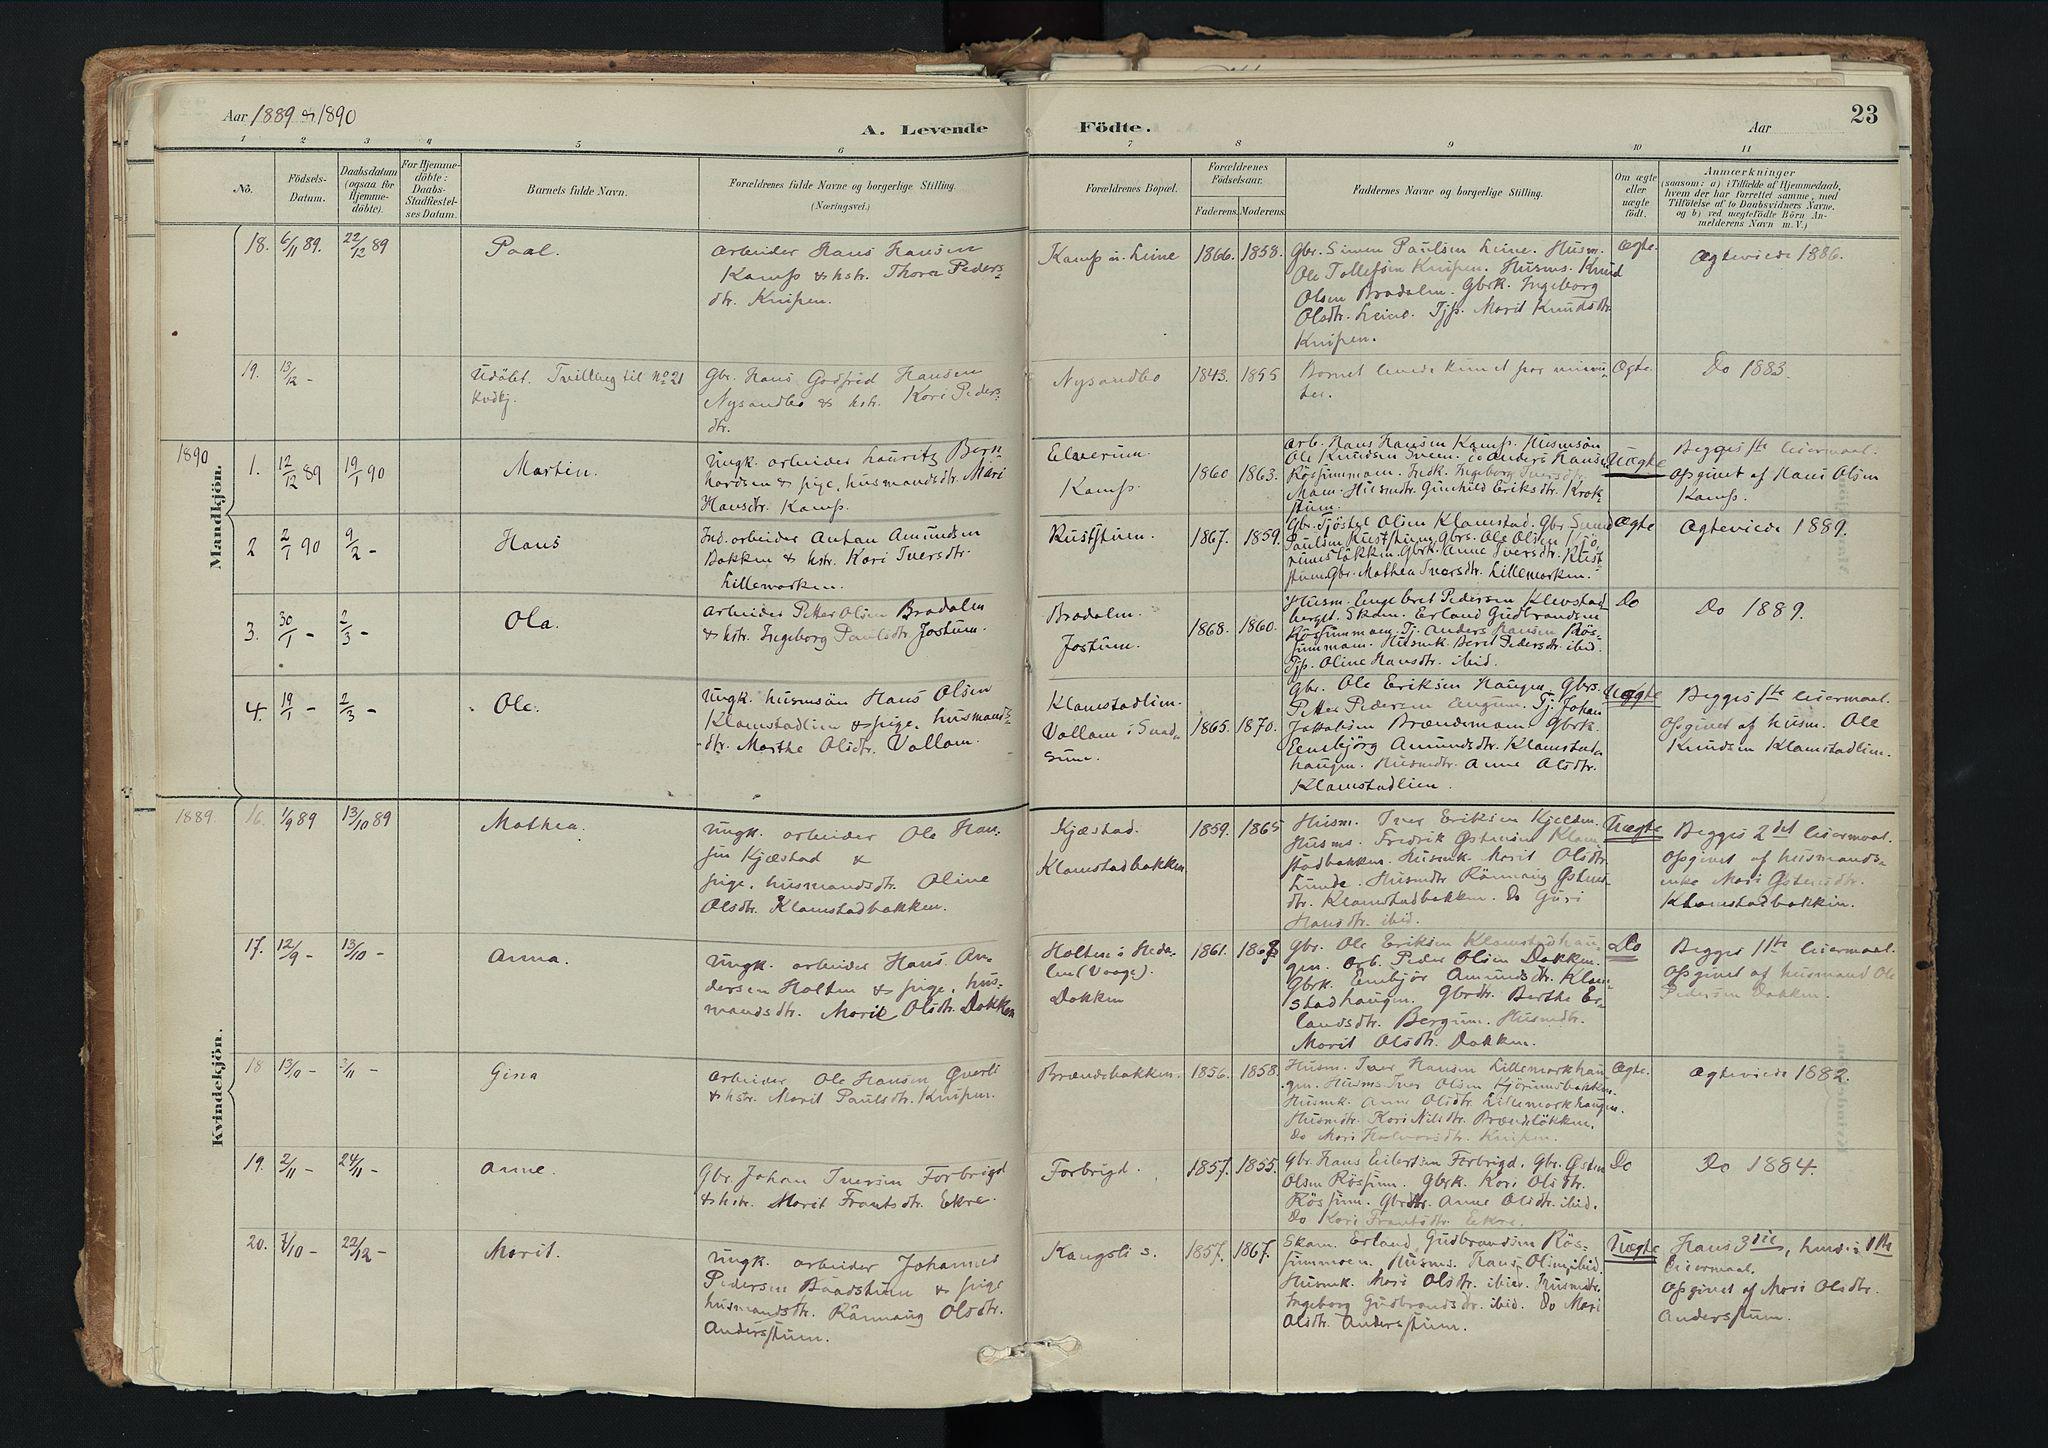 SAH, Nord-Fron prestekontor, Ministerialbok nr. 3, 1884-1914, s. 23